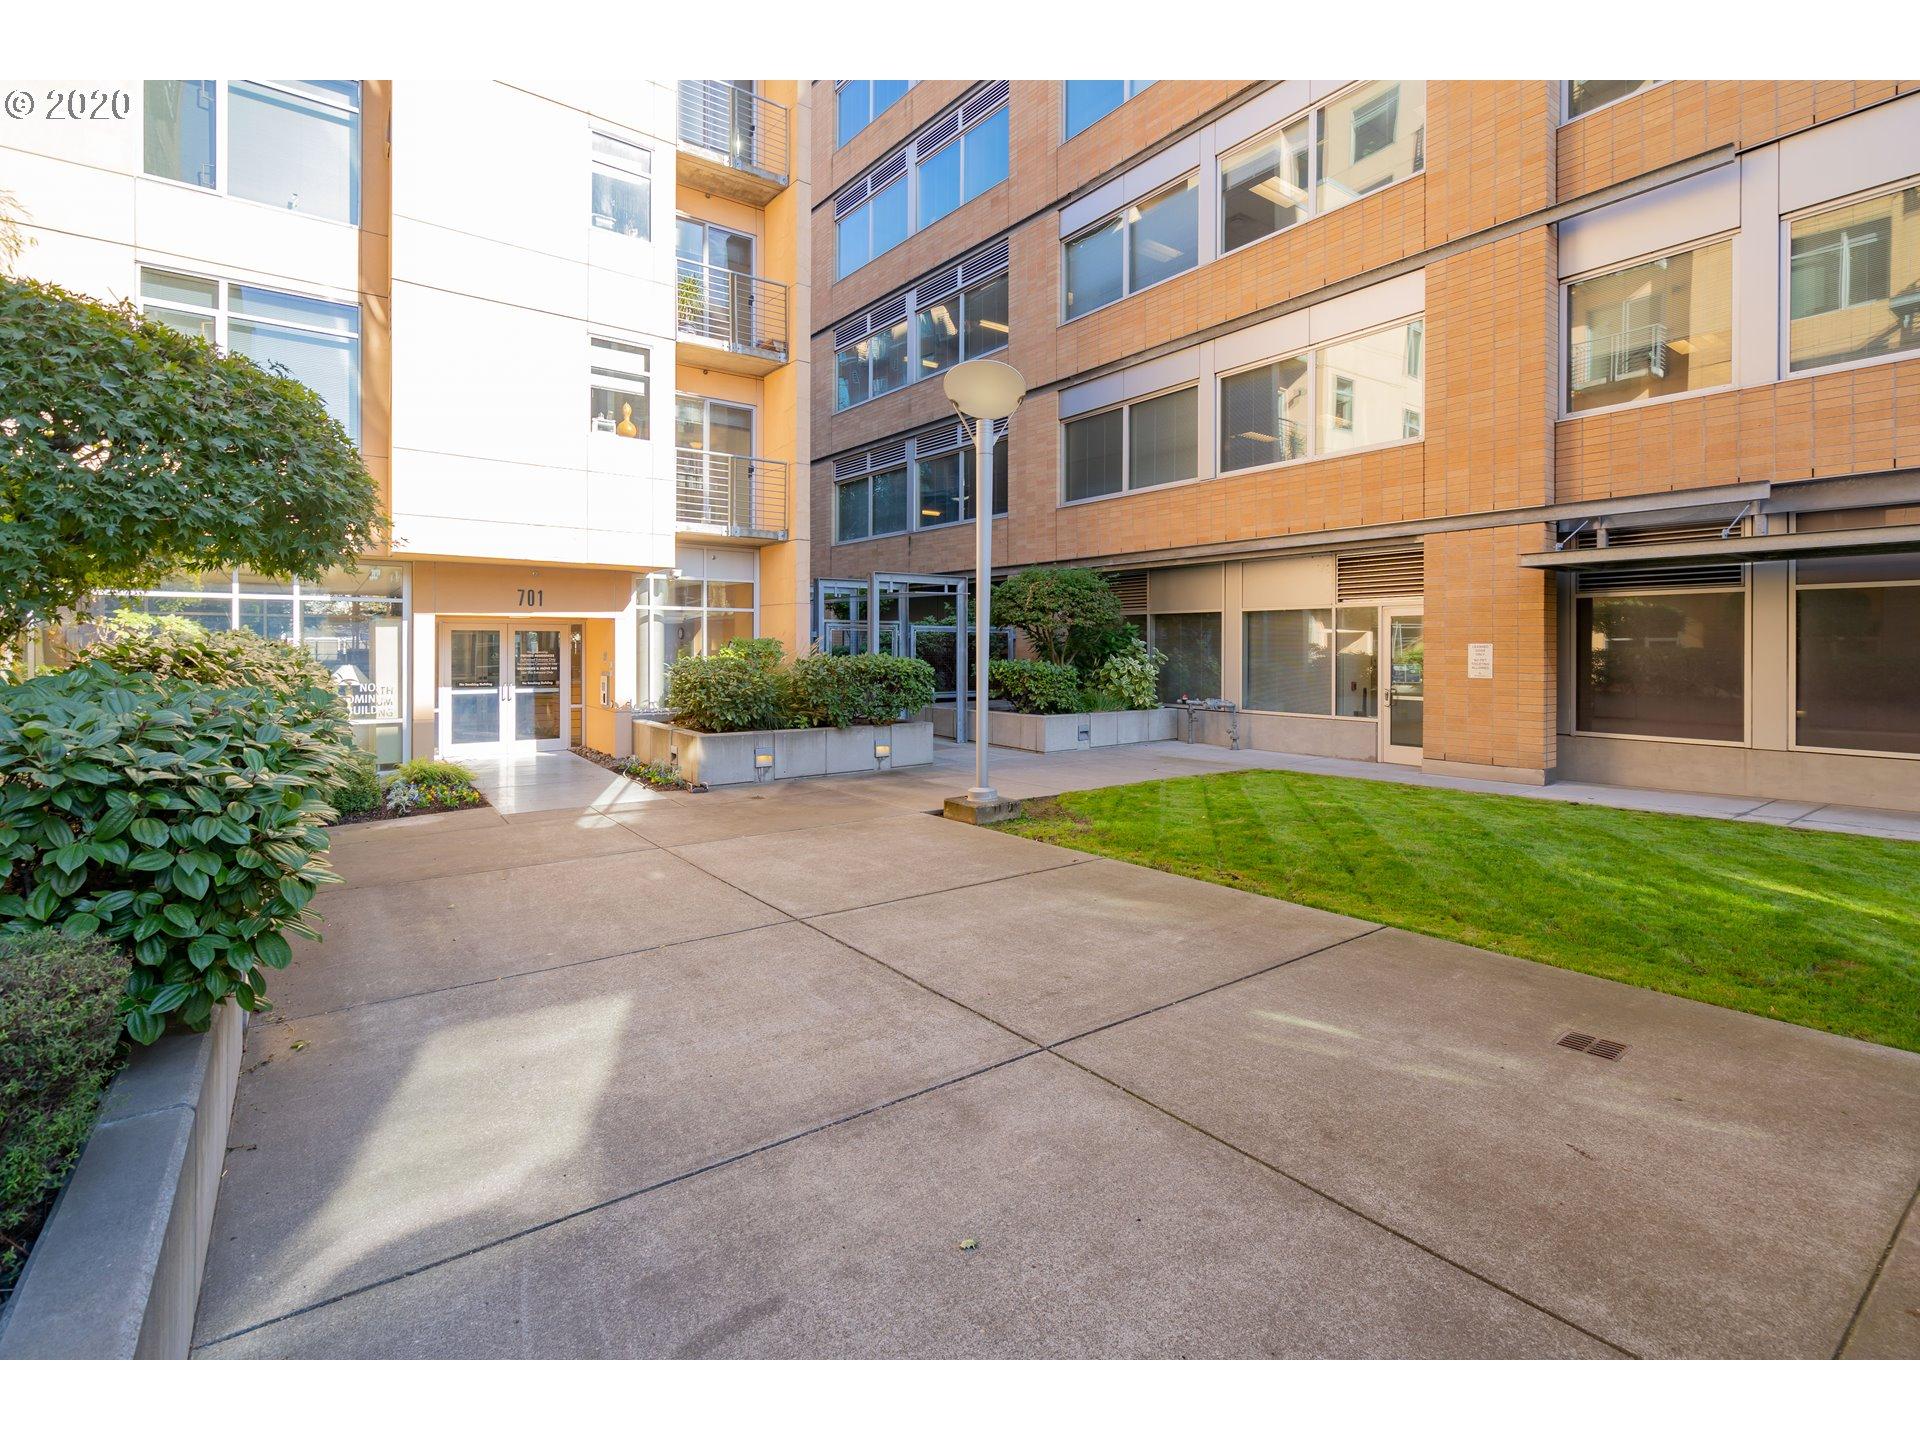 701 COLUMBIA ST 404, Vancouver, Washington 98660, 2 Bedrooms Bedrooms, ,2 BathroomsBathrooms,Condominium,For Sale,701 COLUMBIA ST 404,1,20544540